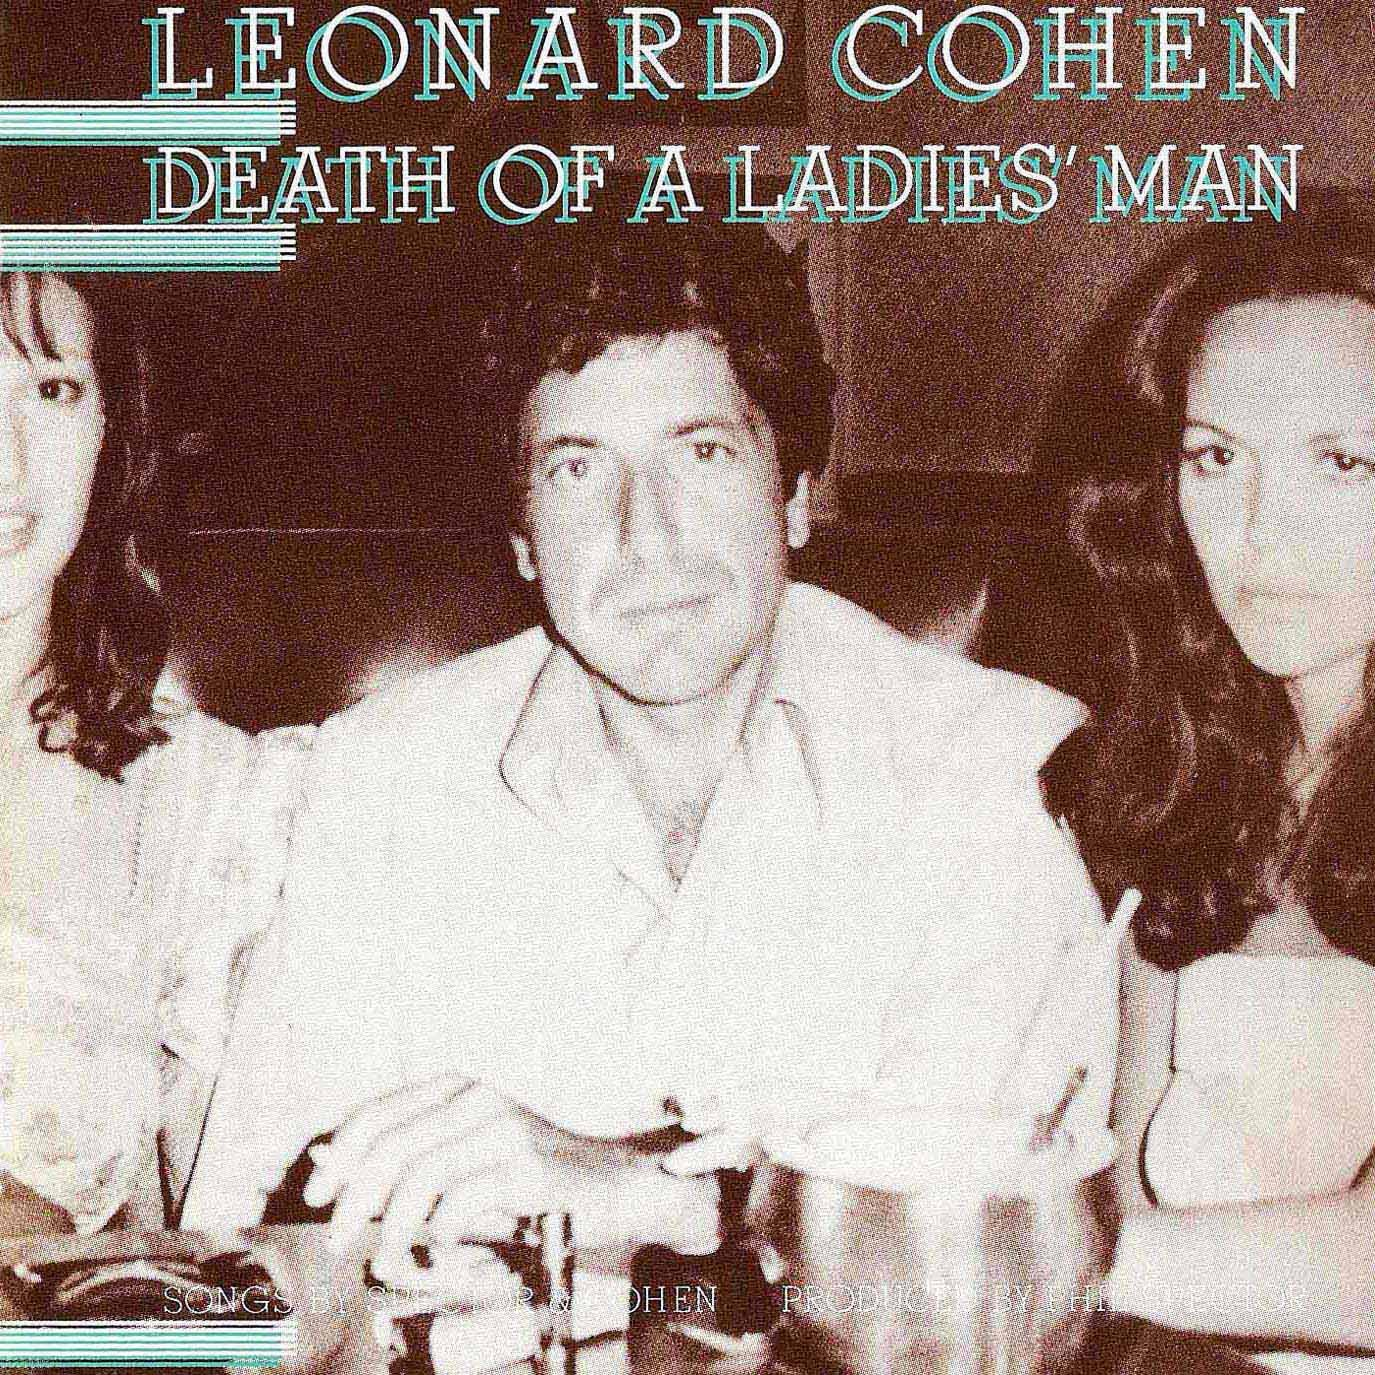 Leonard Cohen Death of a ladies man